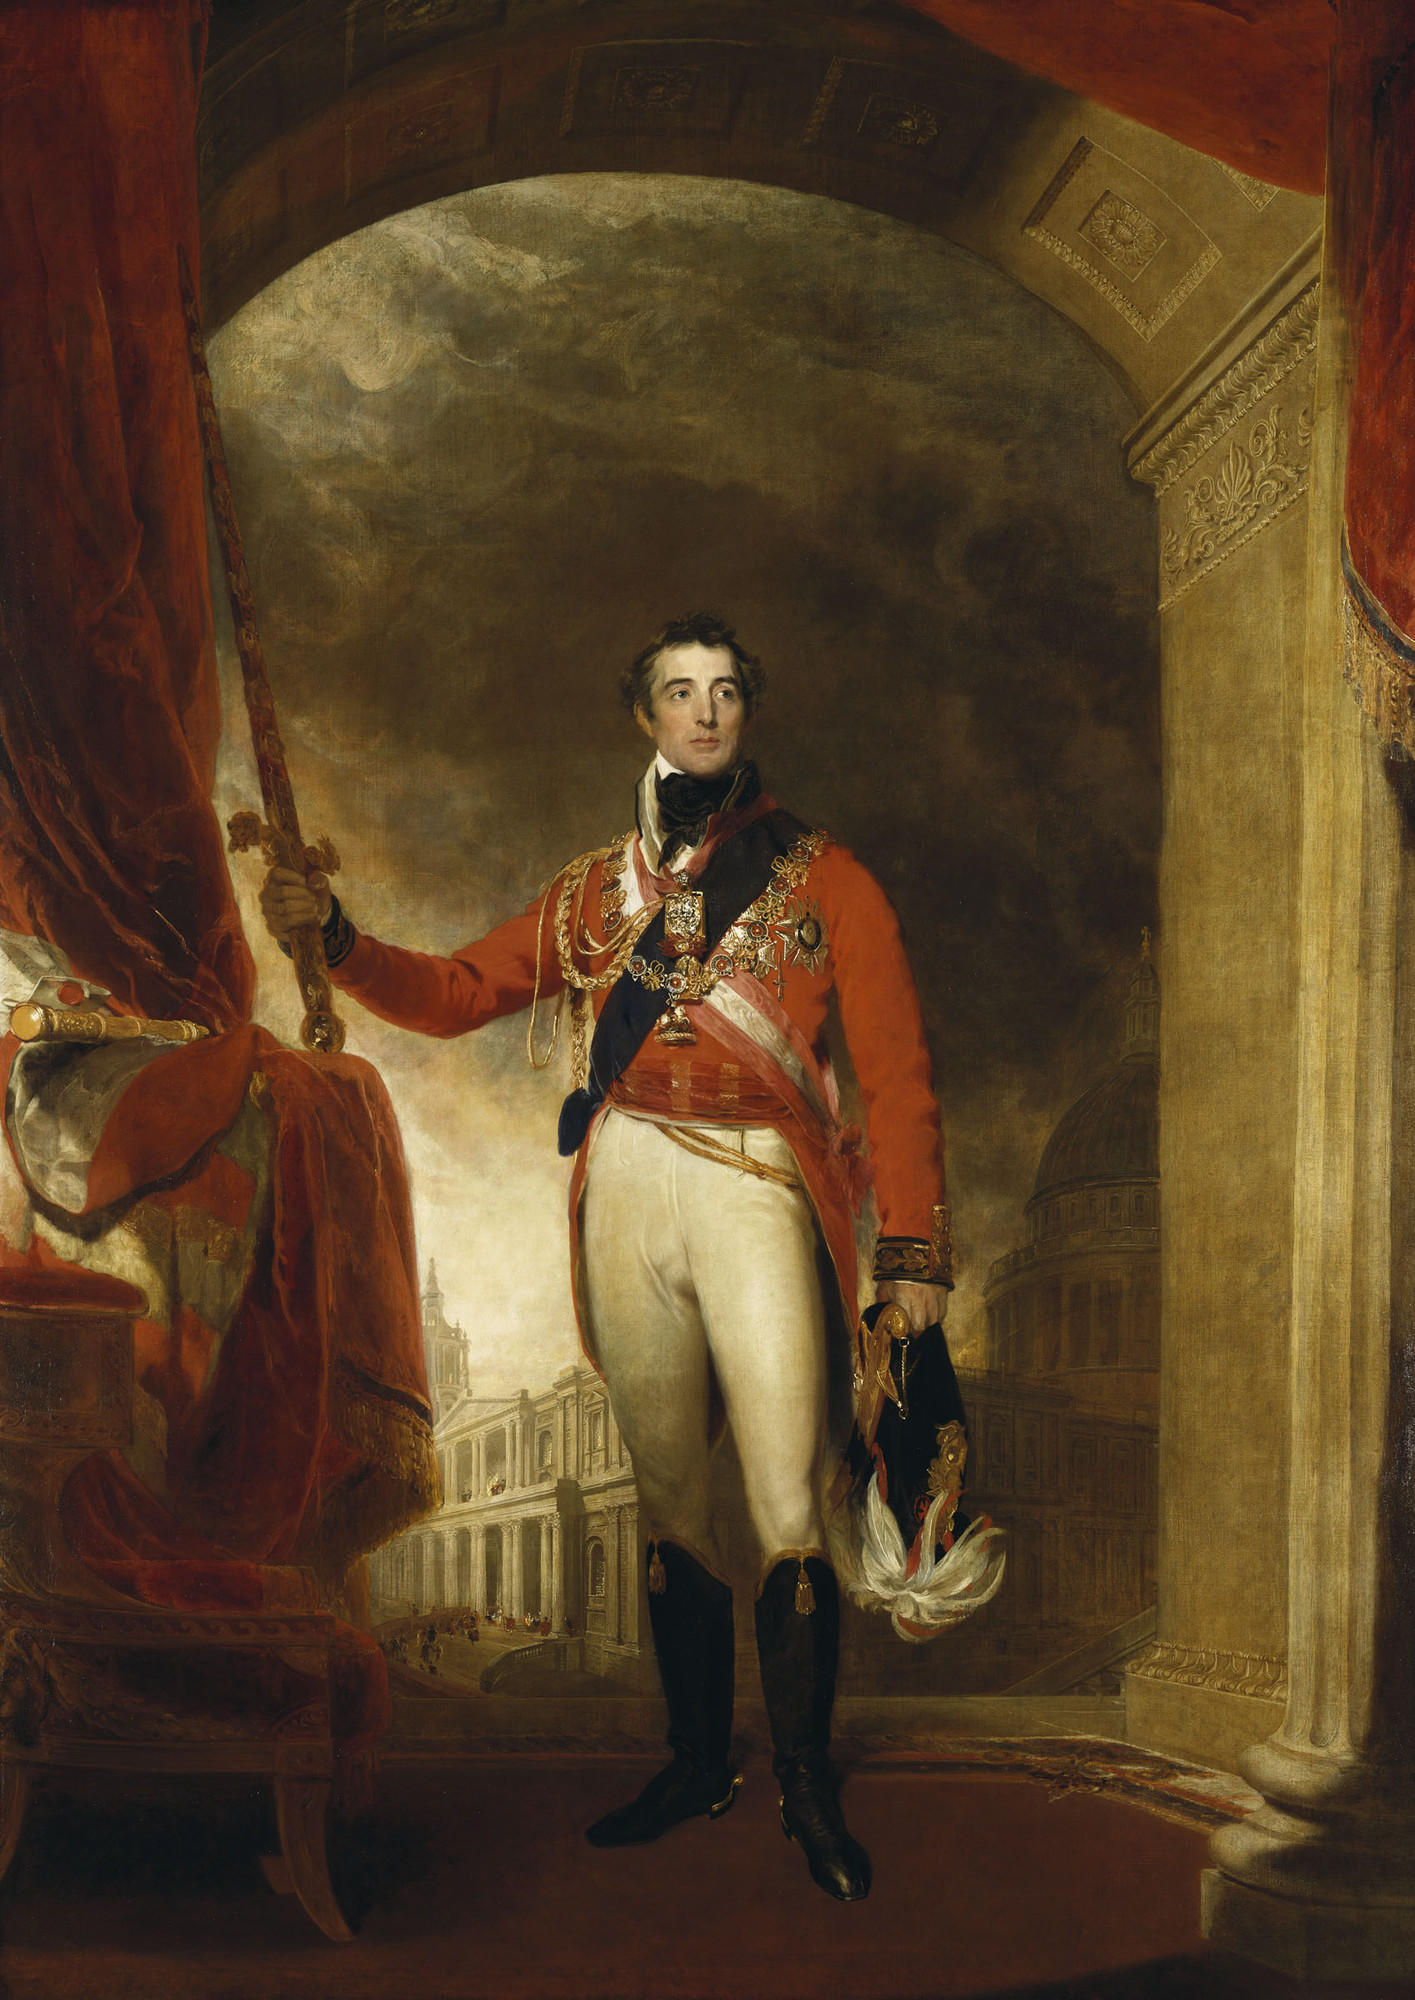 Sir Thomas Lawrence (1769-1830) Arthur Wellesley, 1st Duke of Wellington (1769-1852) 1814-15